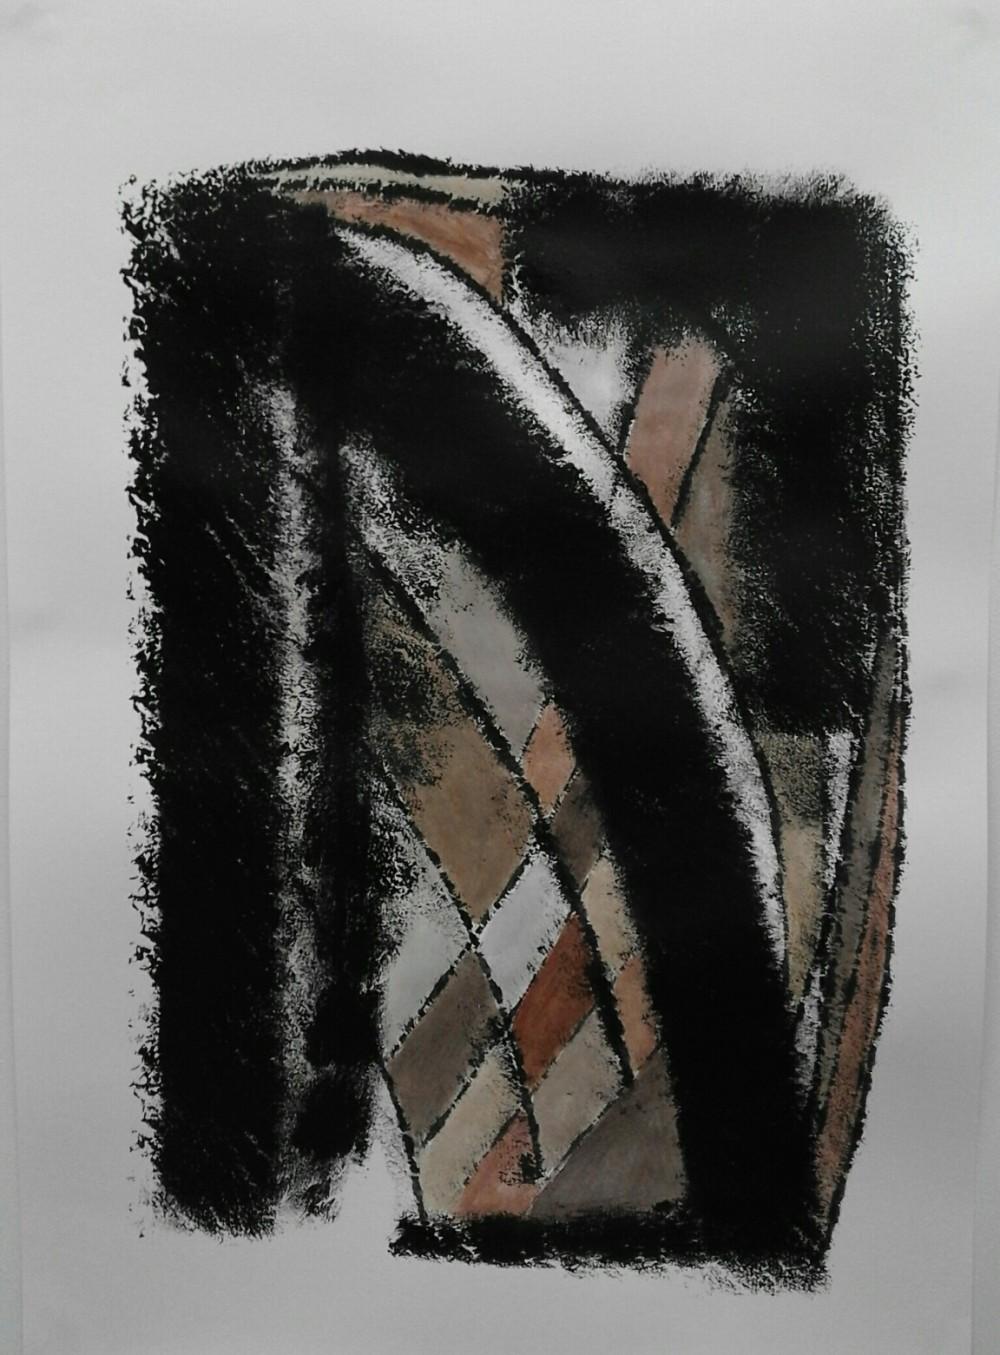 Kerstin Carolin Beyer, Black and brown series, Painting, art work, dynamic art, colors, New York, Acrilic on paper